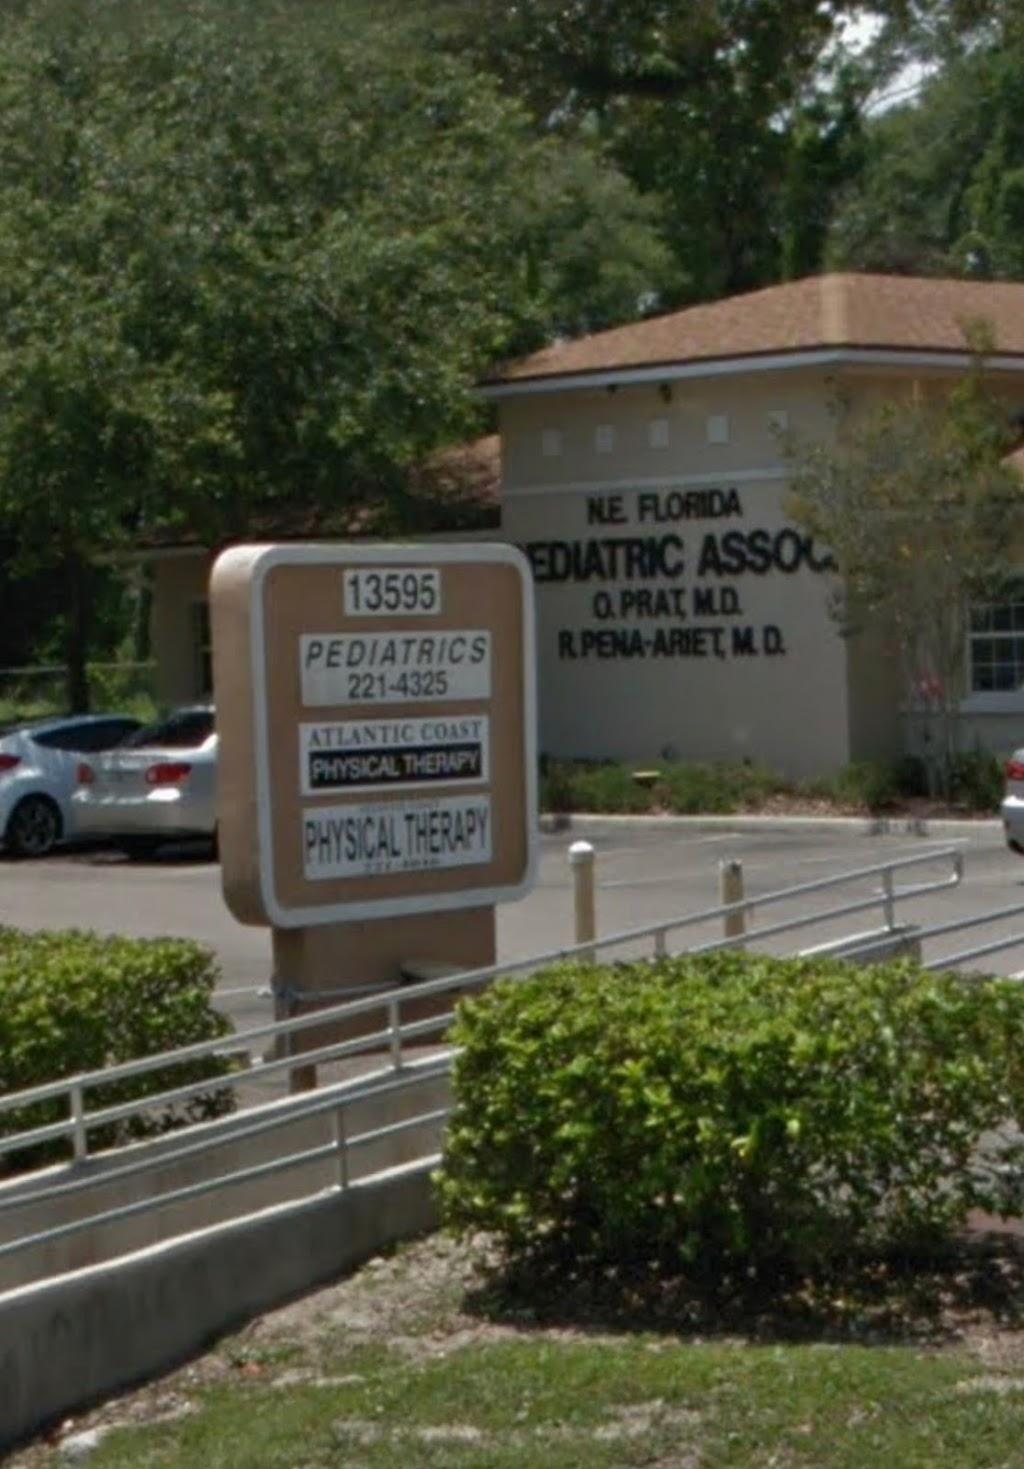 Dr. Rodolfo Pena-Ariet, MD - doctor  | Photo 2 of 3 | Address: 13595 Atlantic Blvd, Jacksonville, FL 32225, USA | Phone: (904) 221-4325